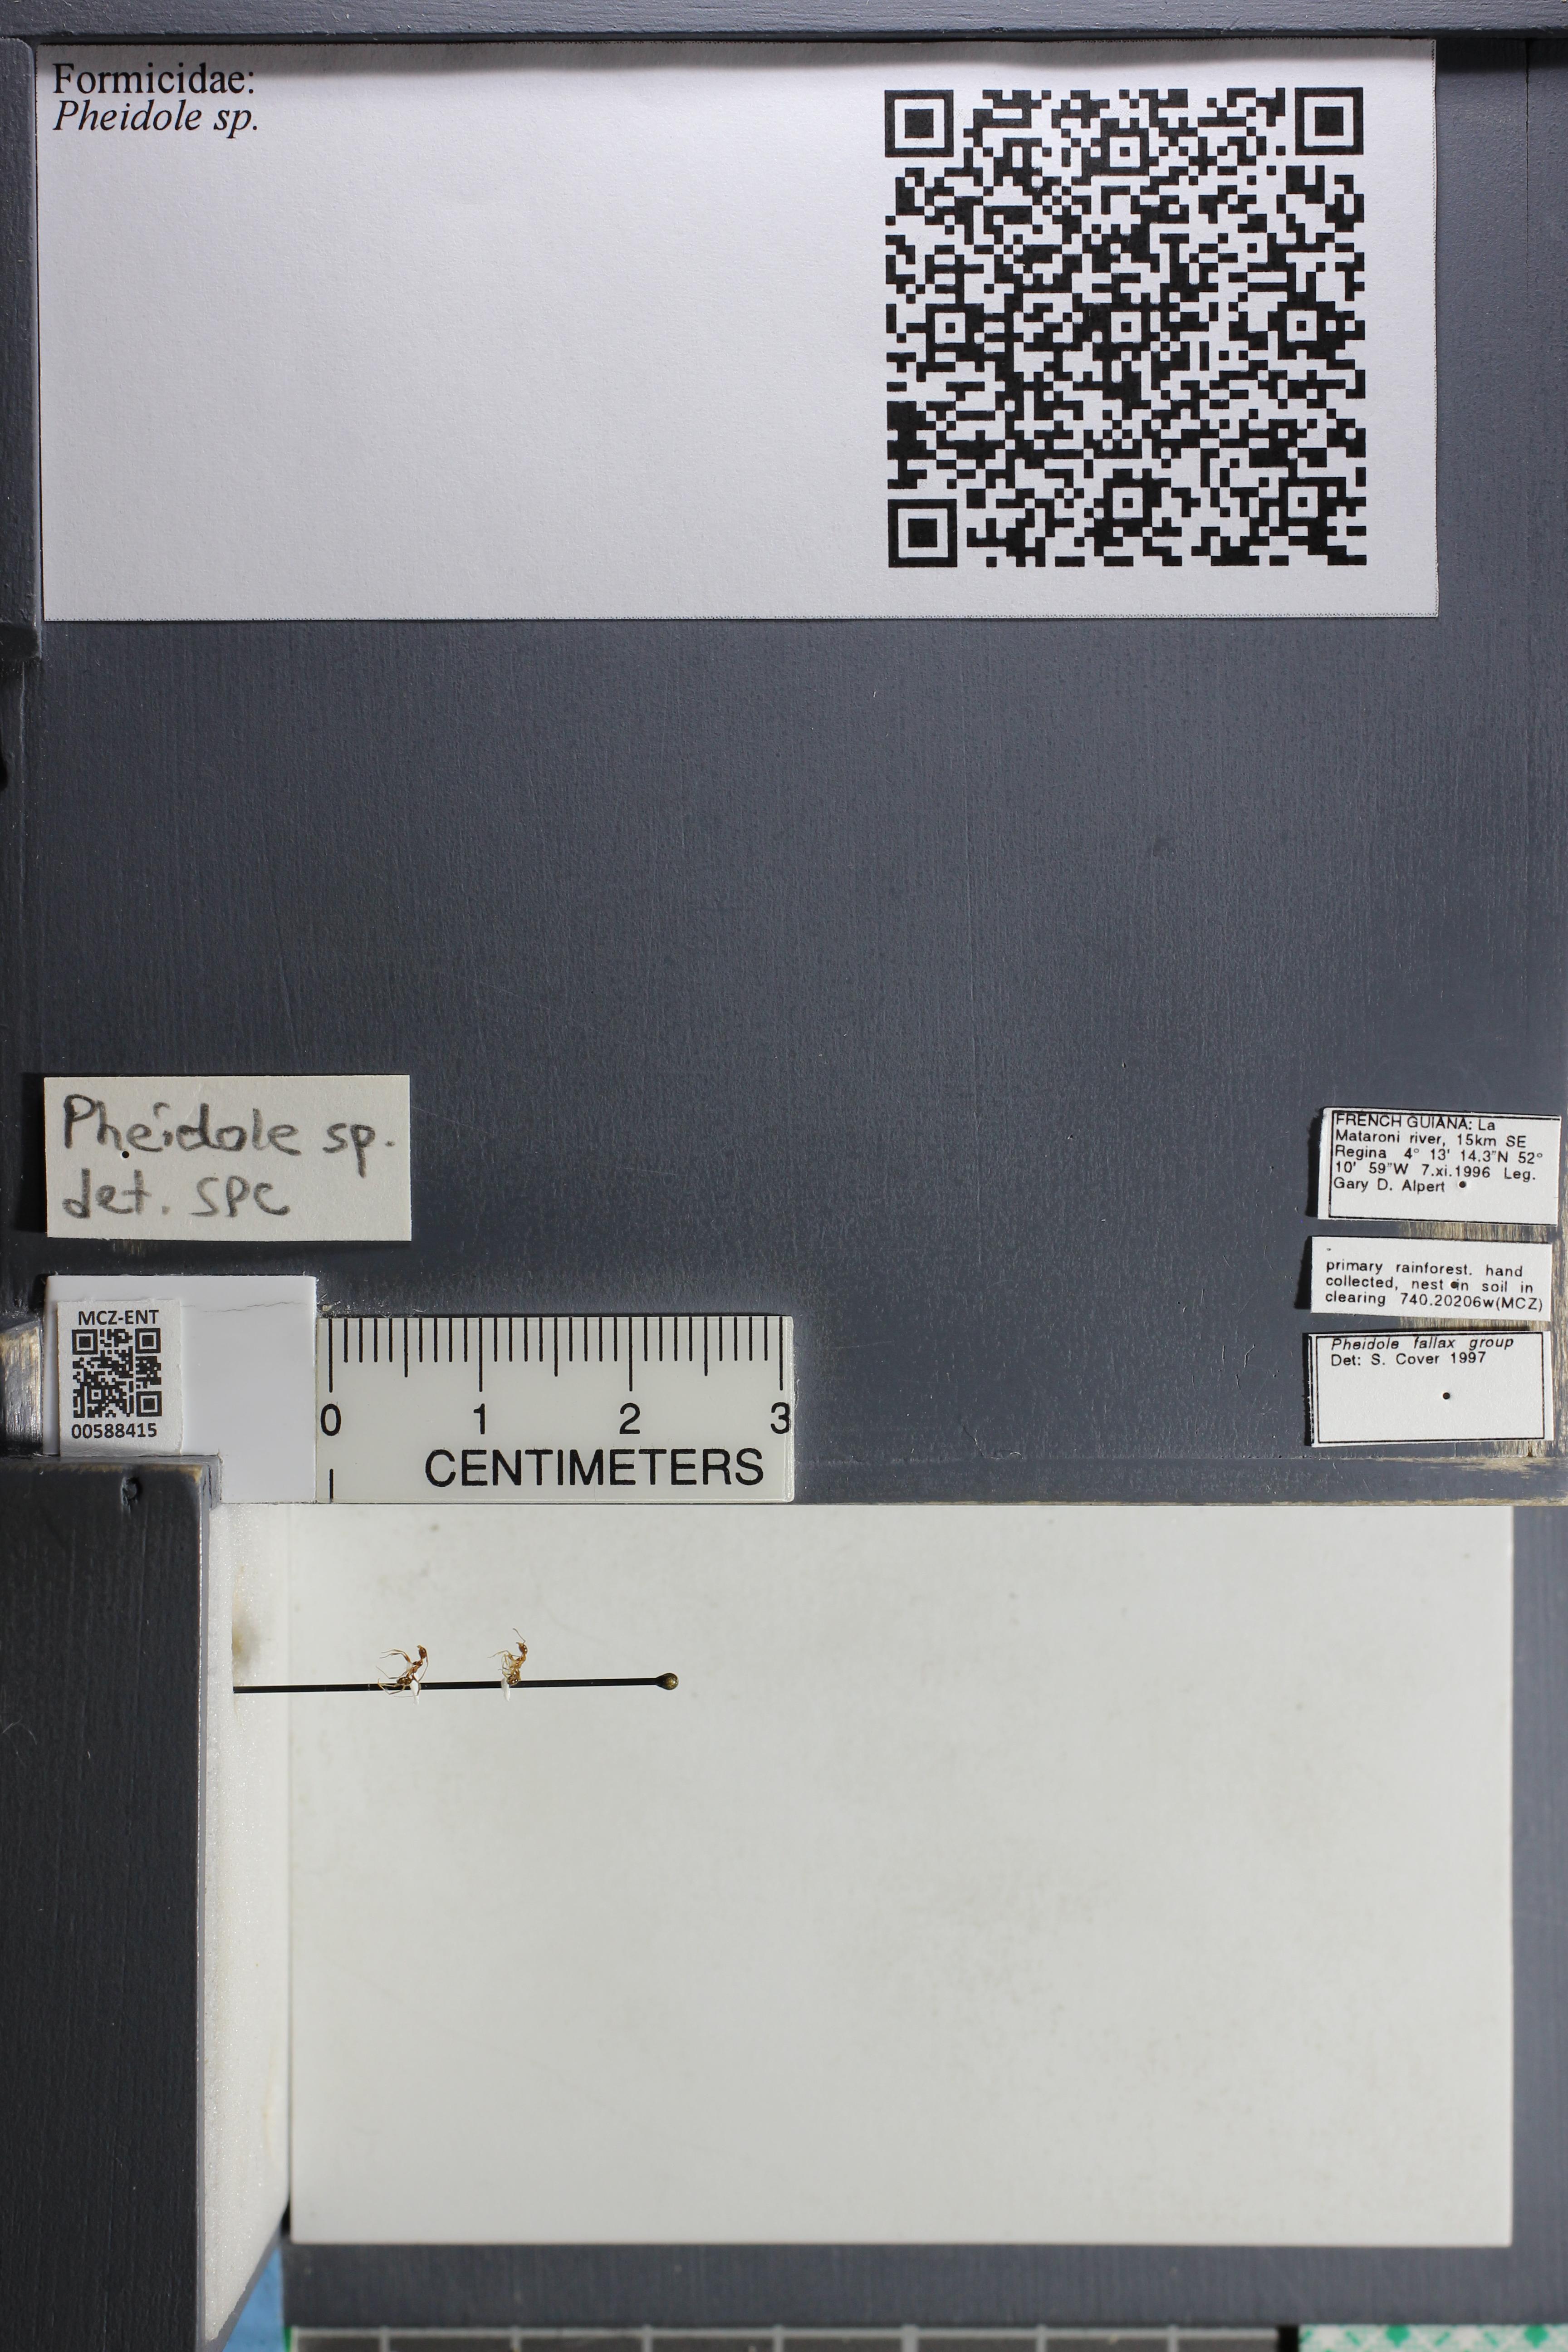 Media of type image, MCZ:Ent:588415 Identified as Pheidole sp..